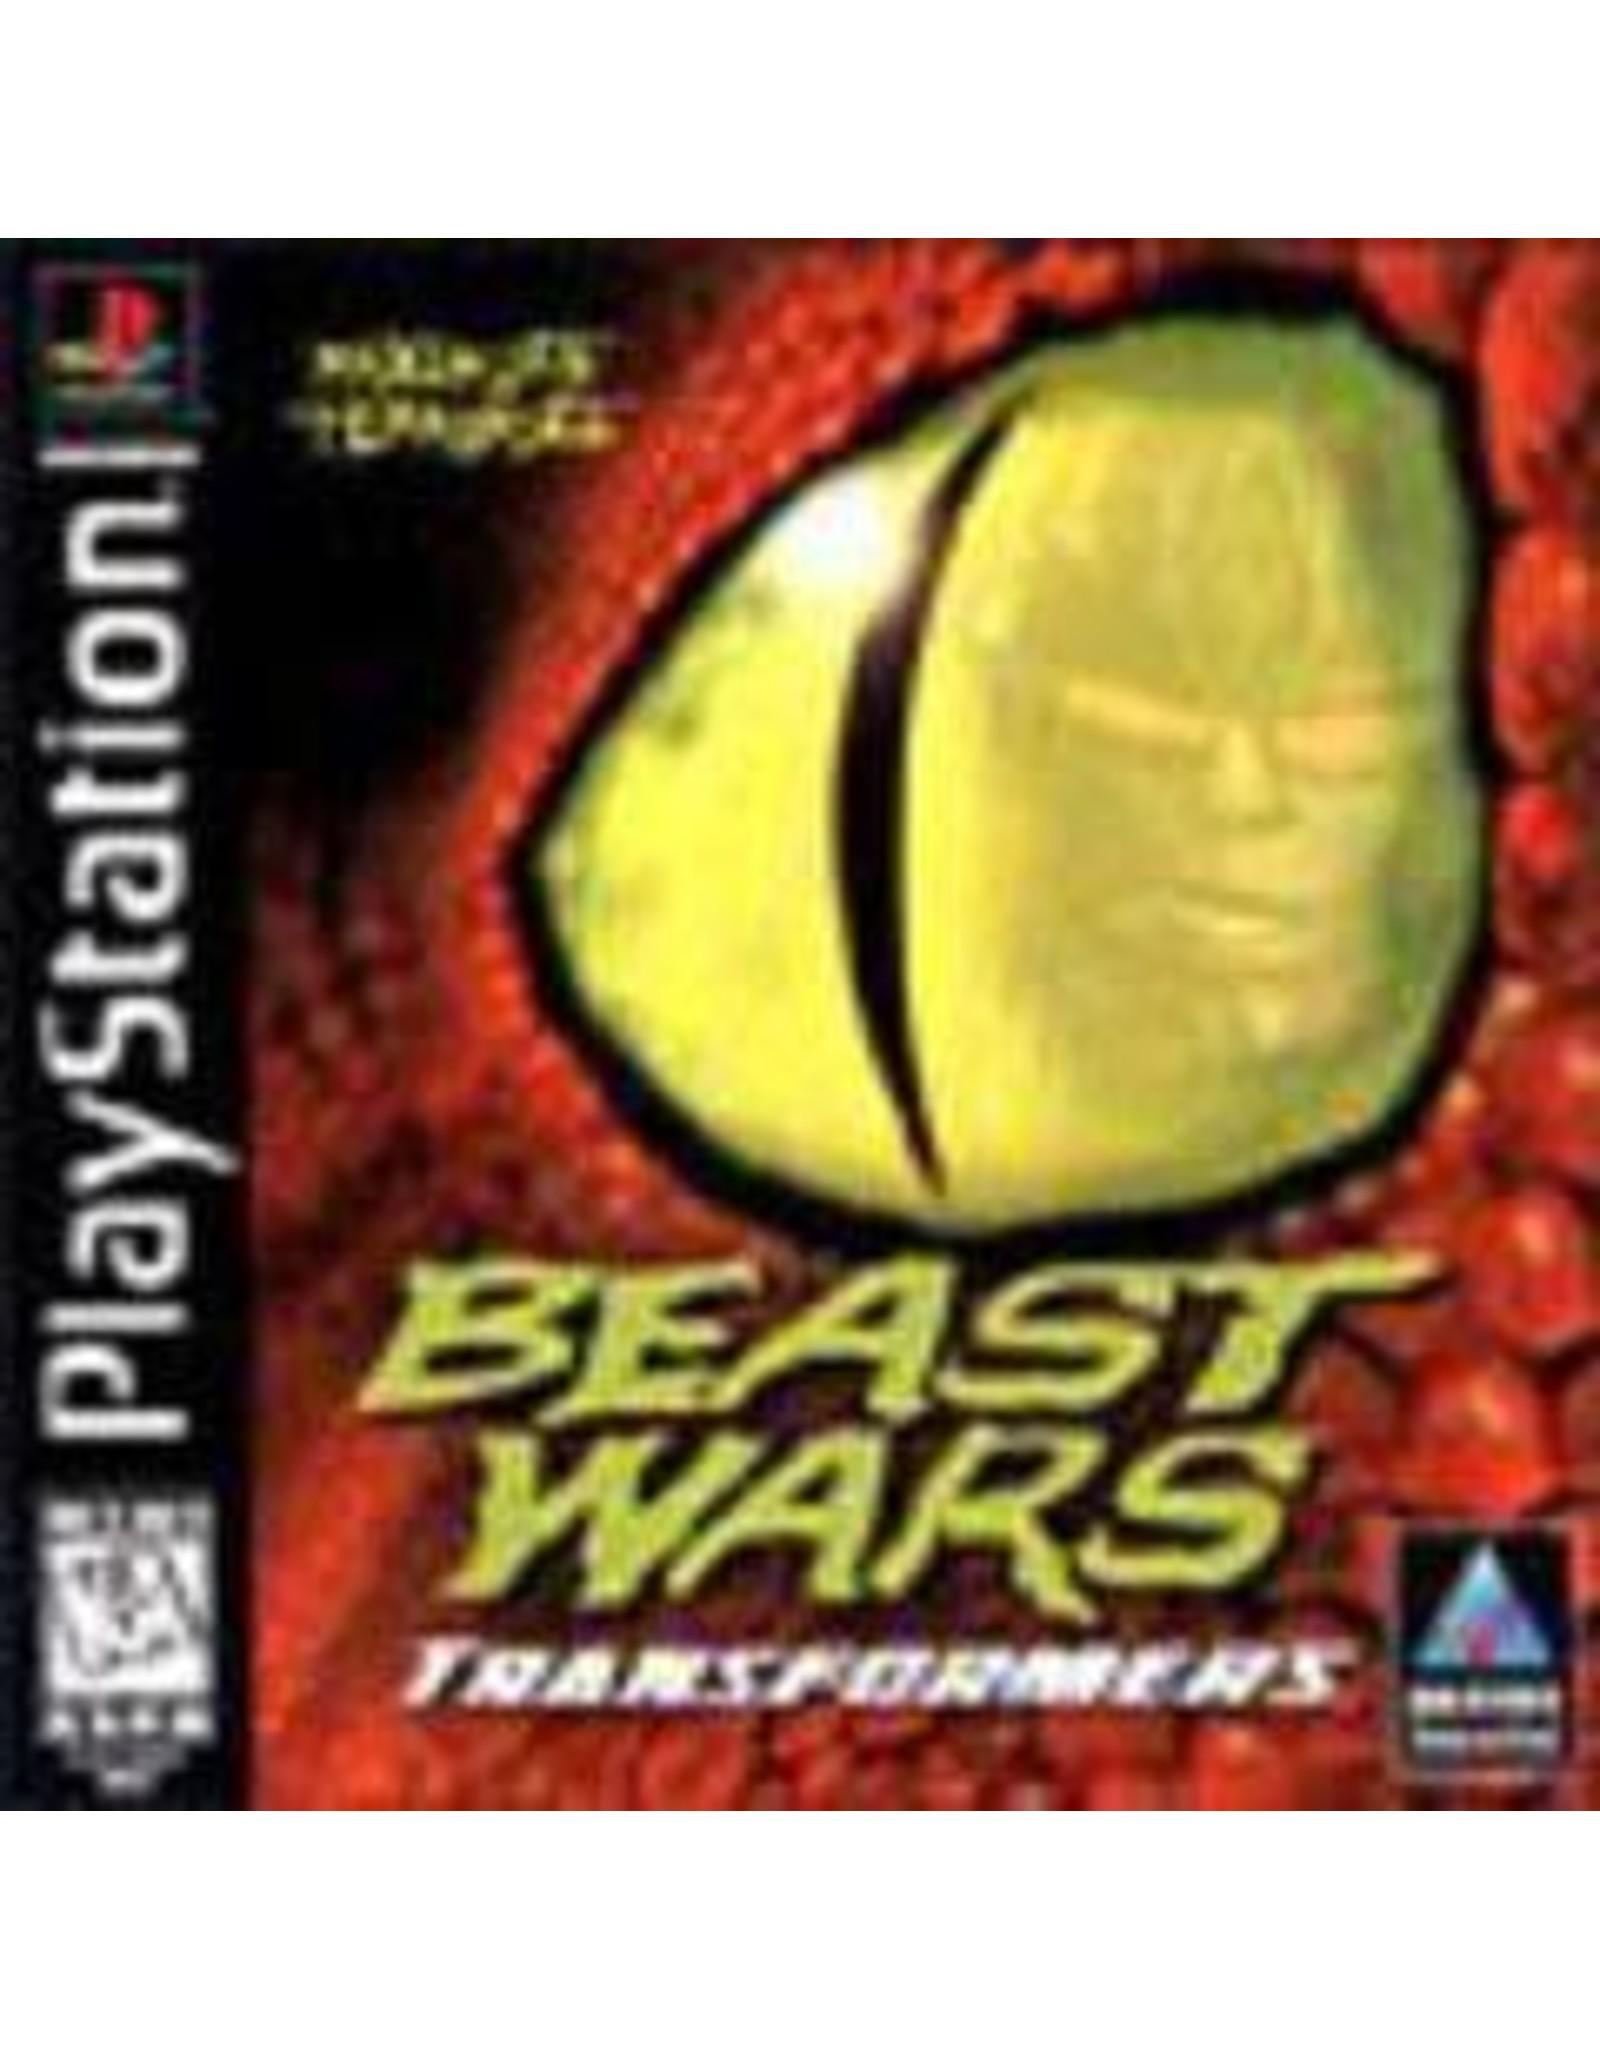 Playstation Beast Wars Transformers (No Manual)